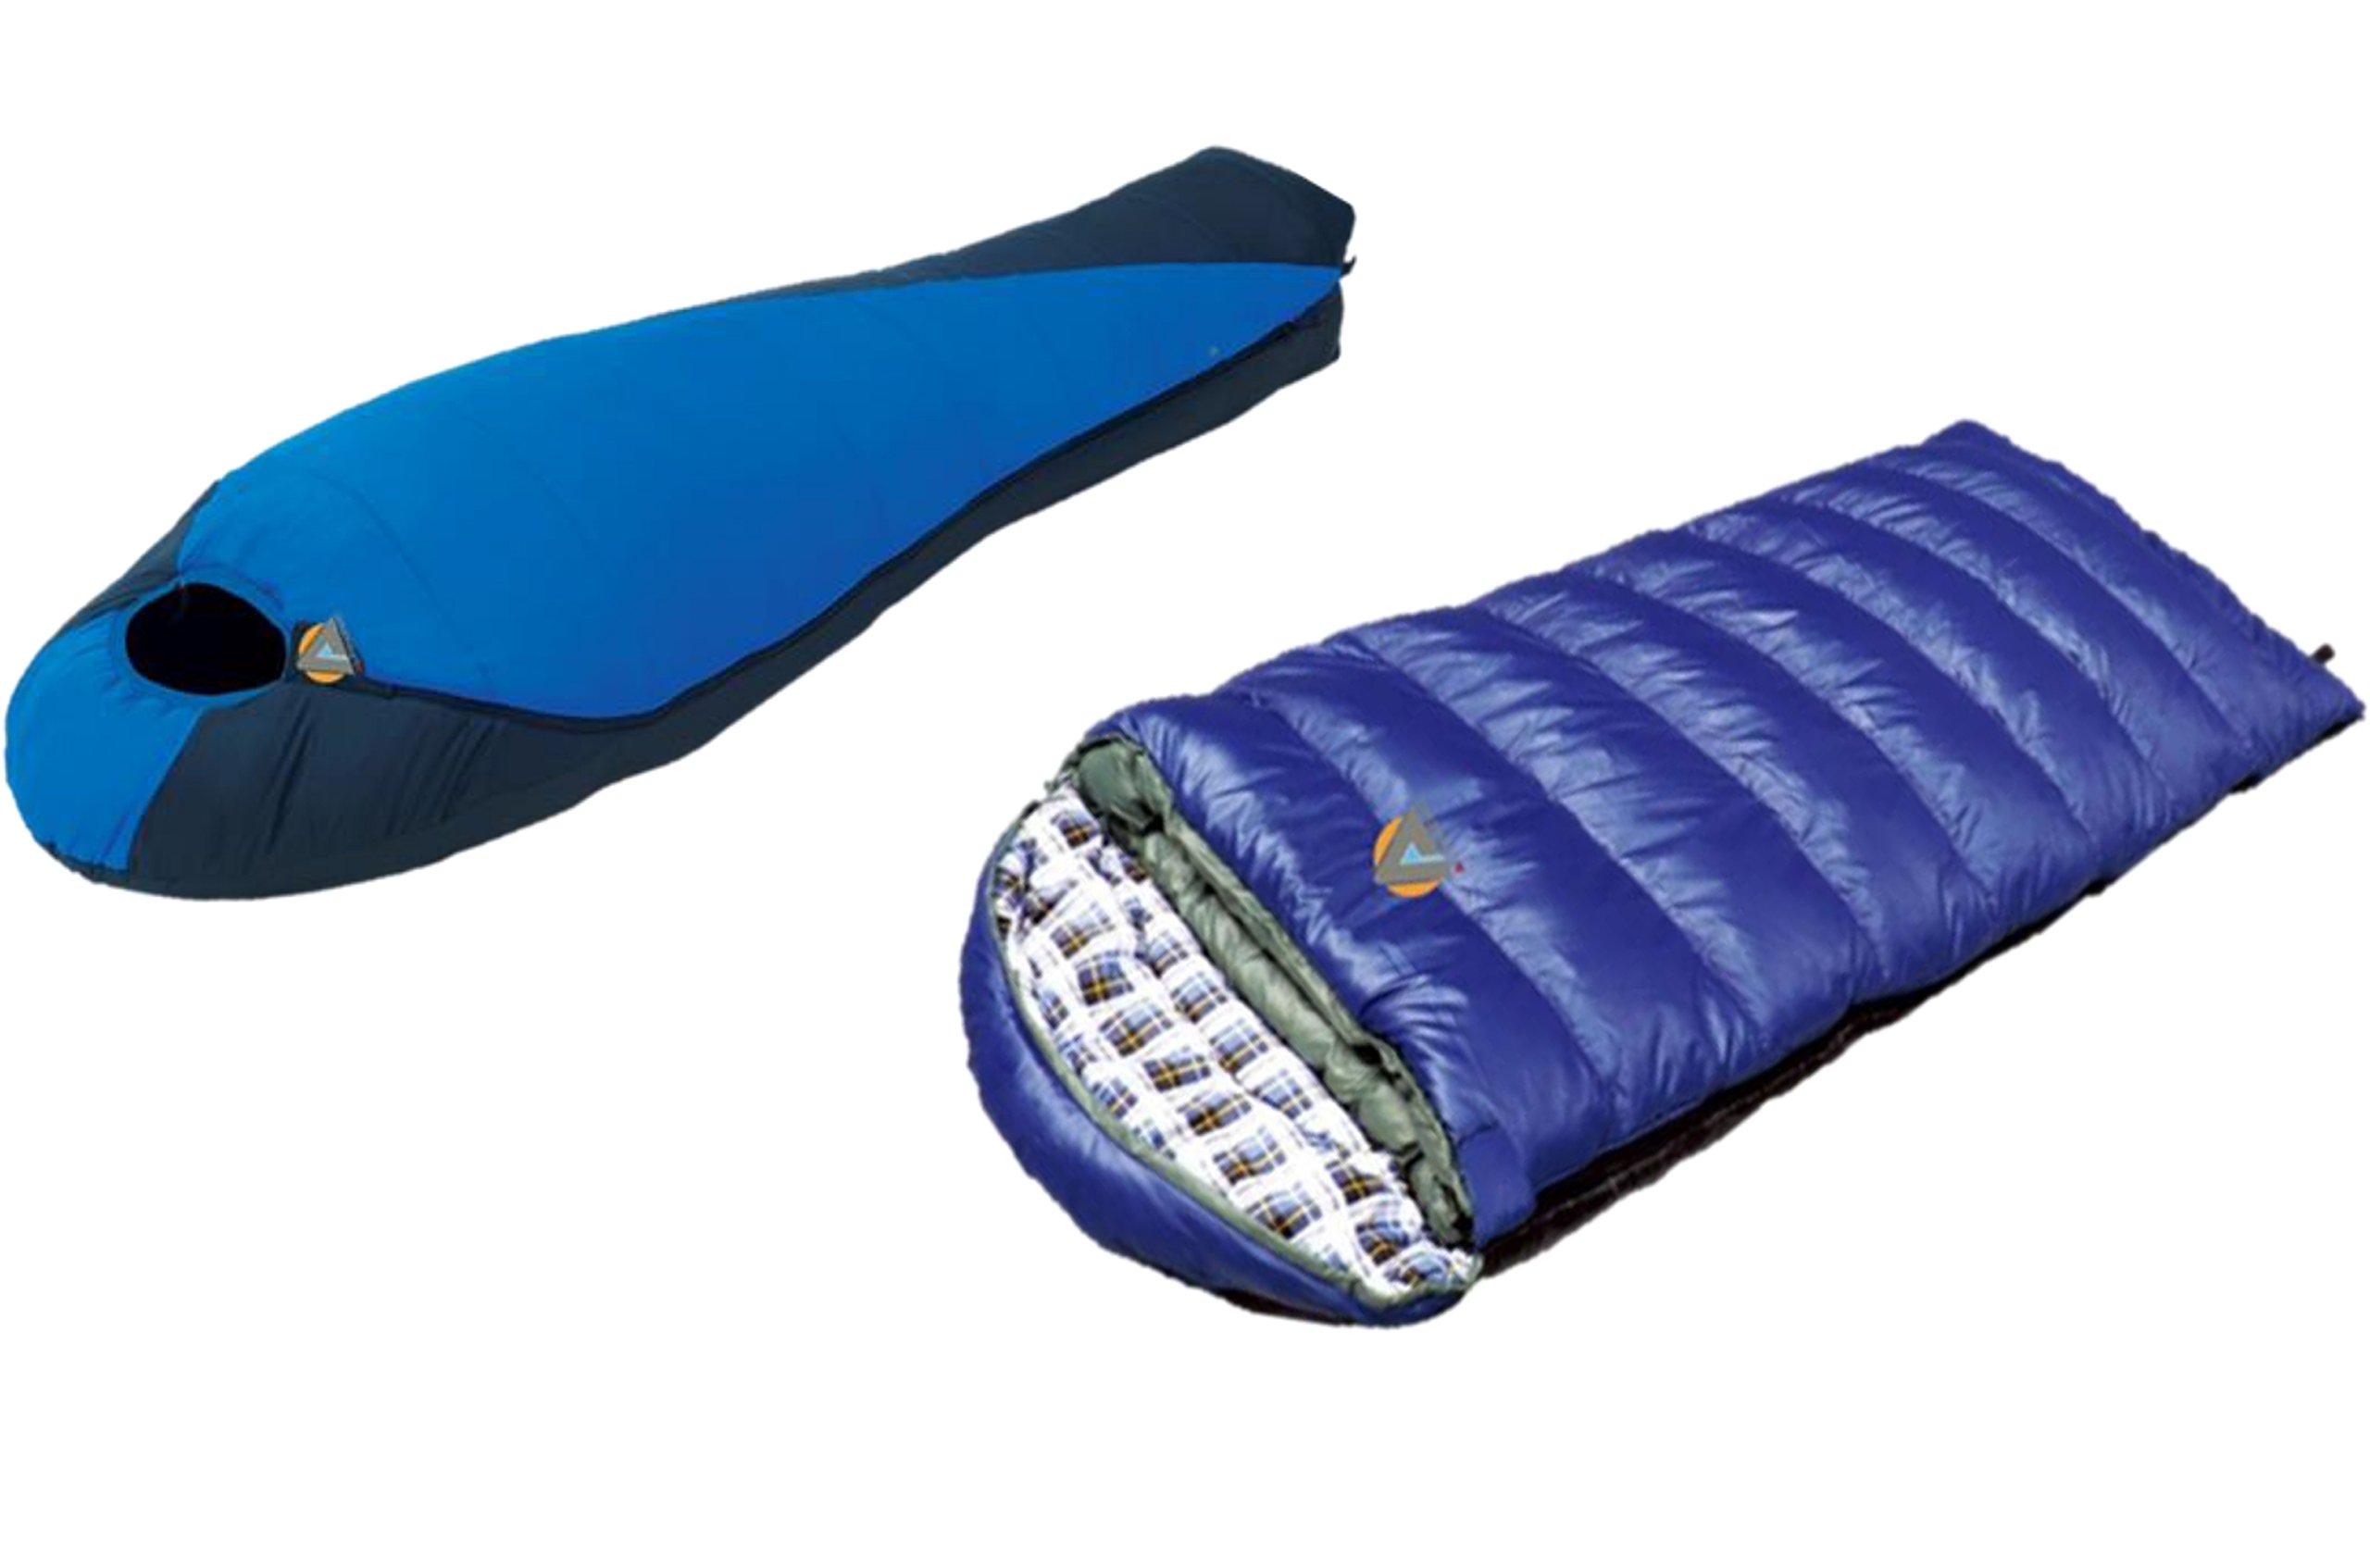 High Peak USA Alpinizmo Lite Weight Extreme Pak 0F + Kodiak 0F Sleeping Bag Combo Set, Blue, One Size by Alpinizmo